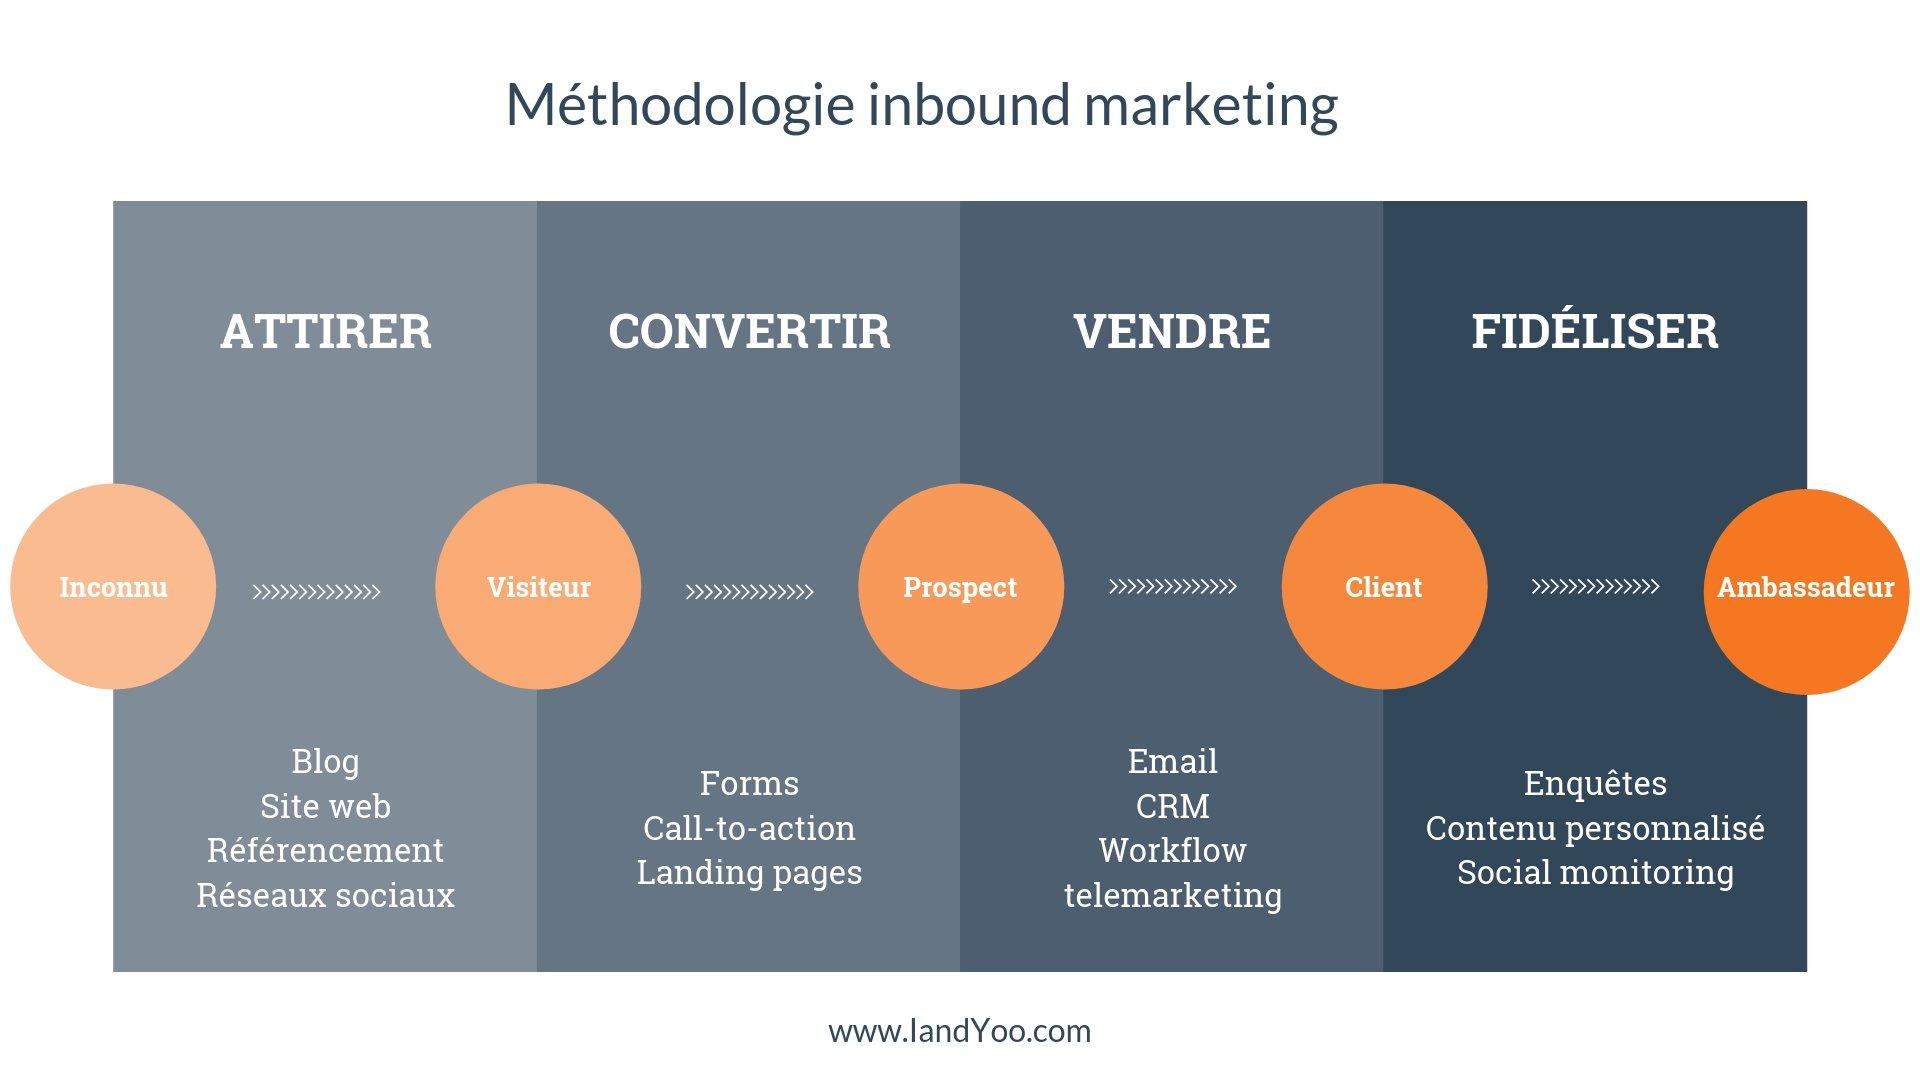 Méthodologie inbound marketing IANDYOO